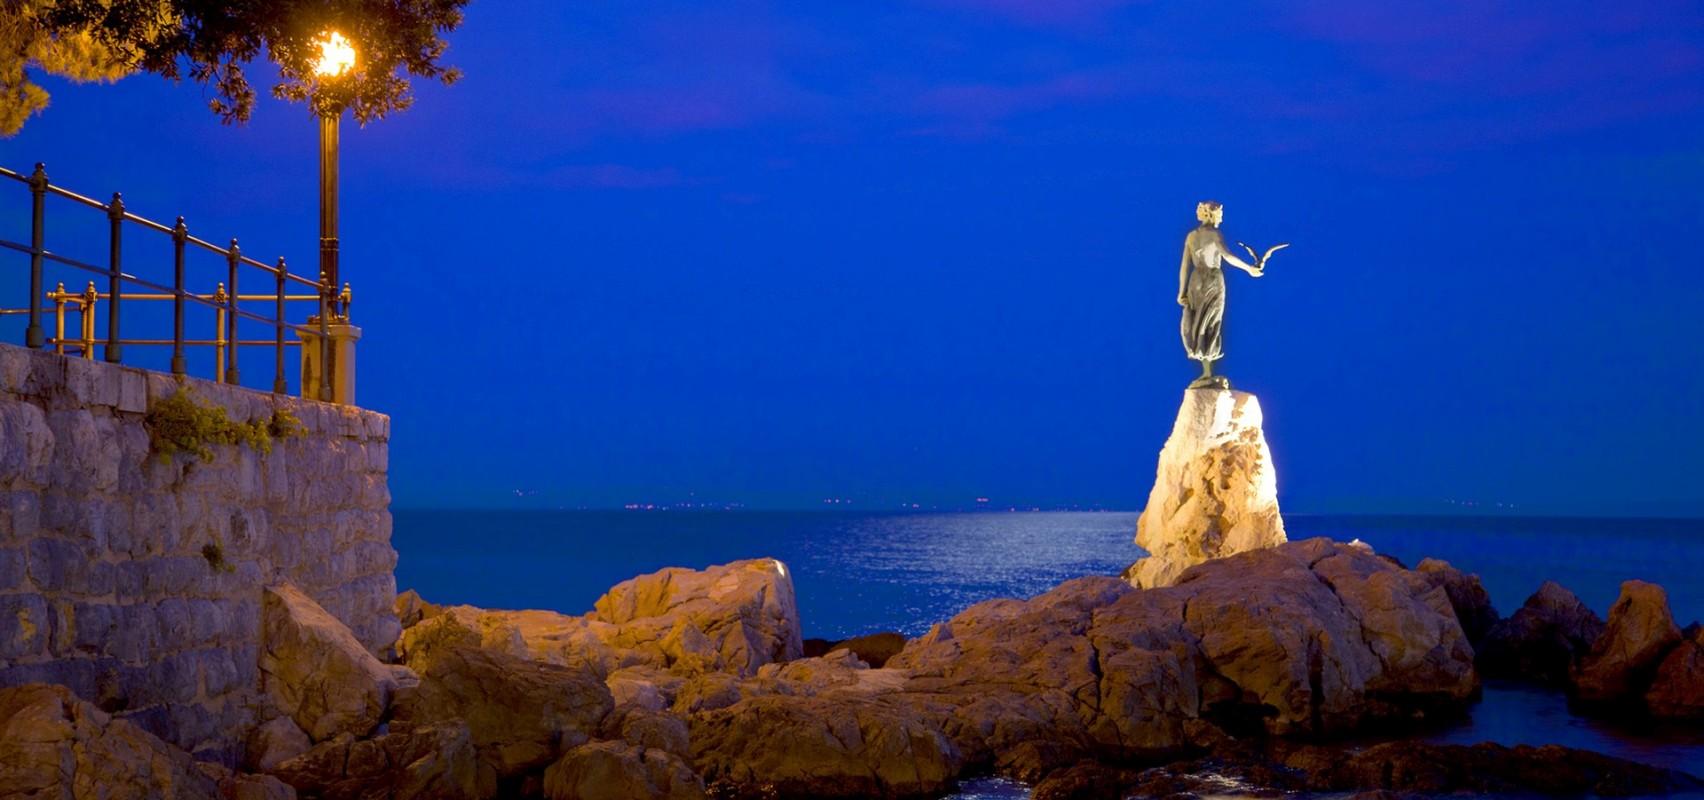 opatija in croatia   the pearl of the adriatic